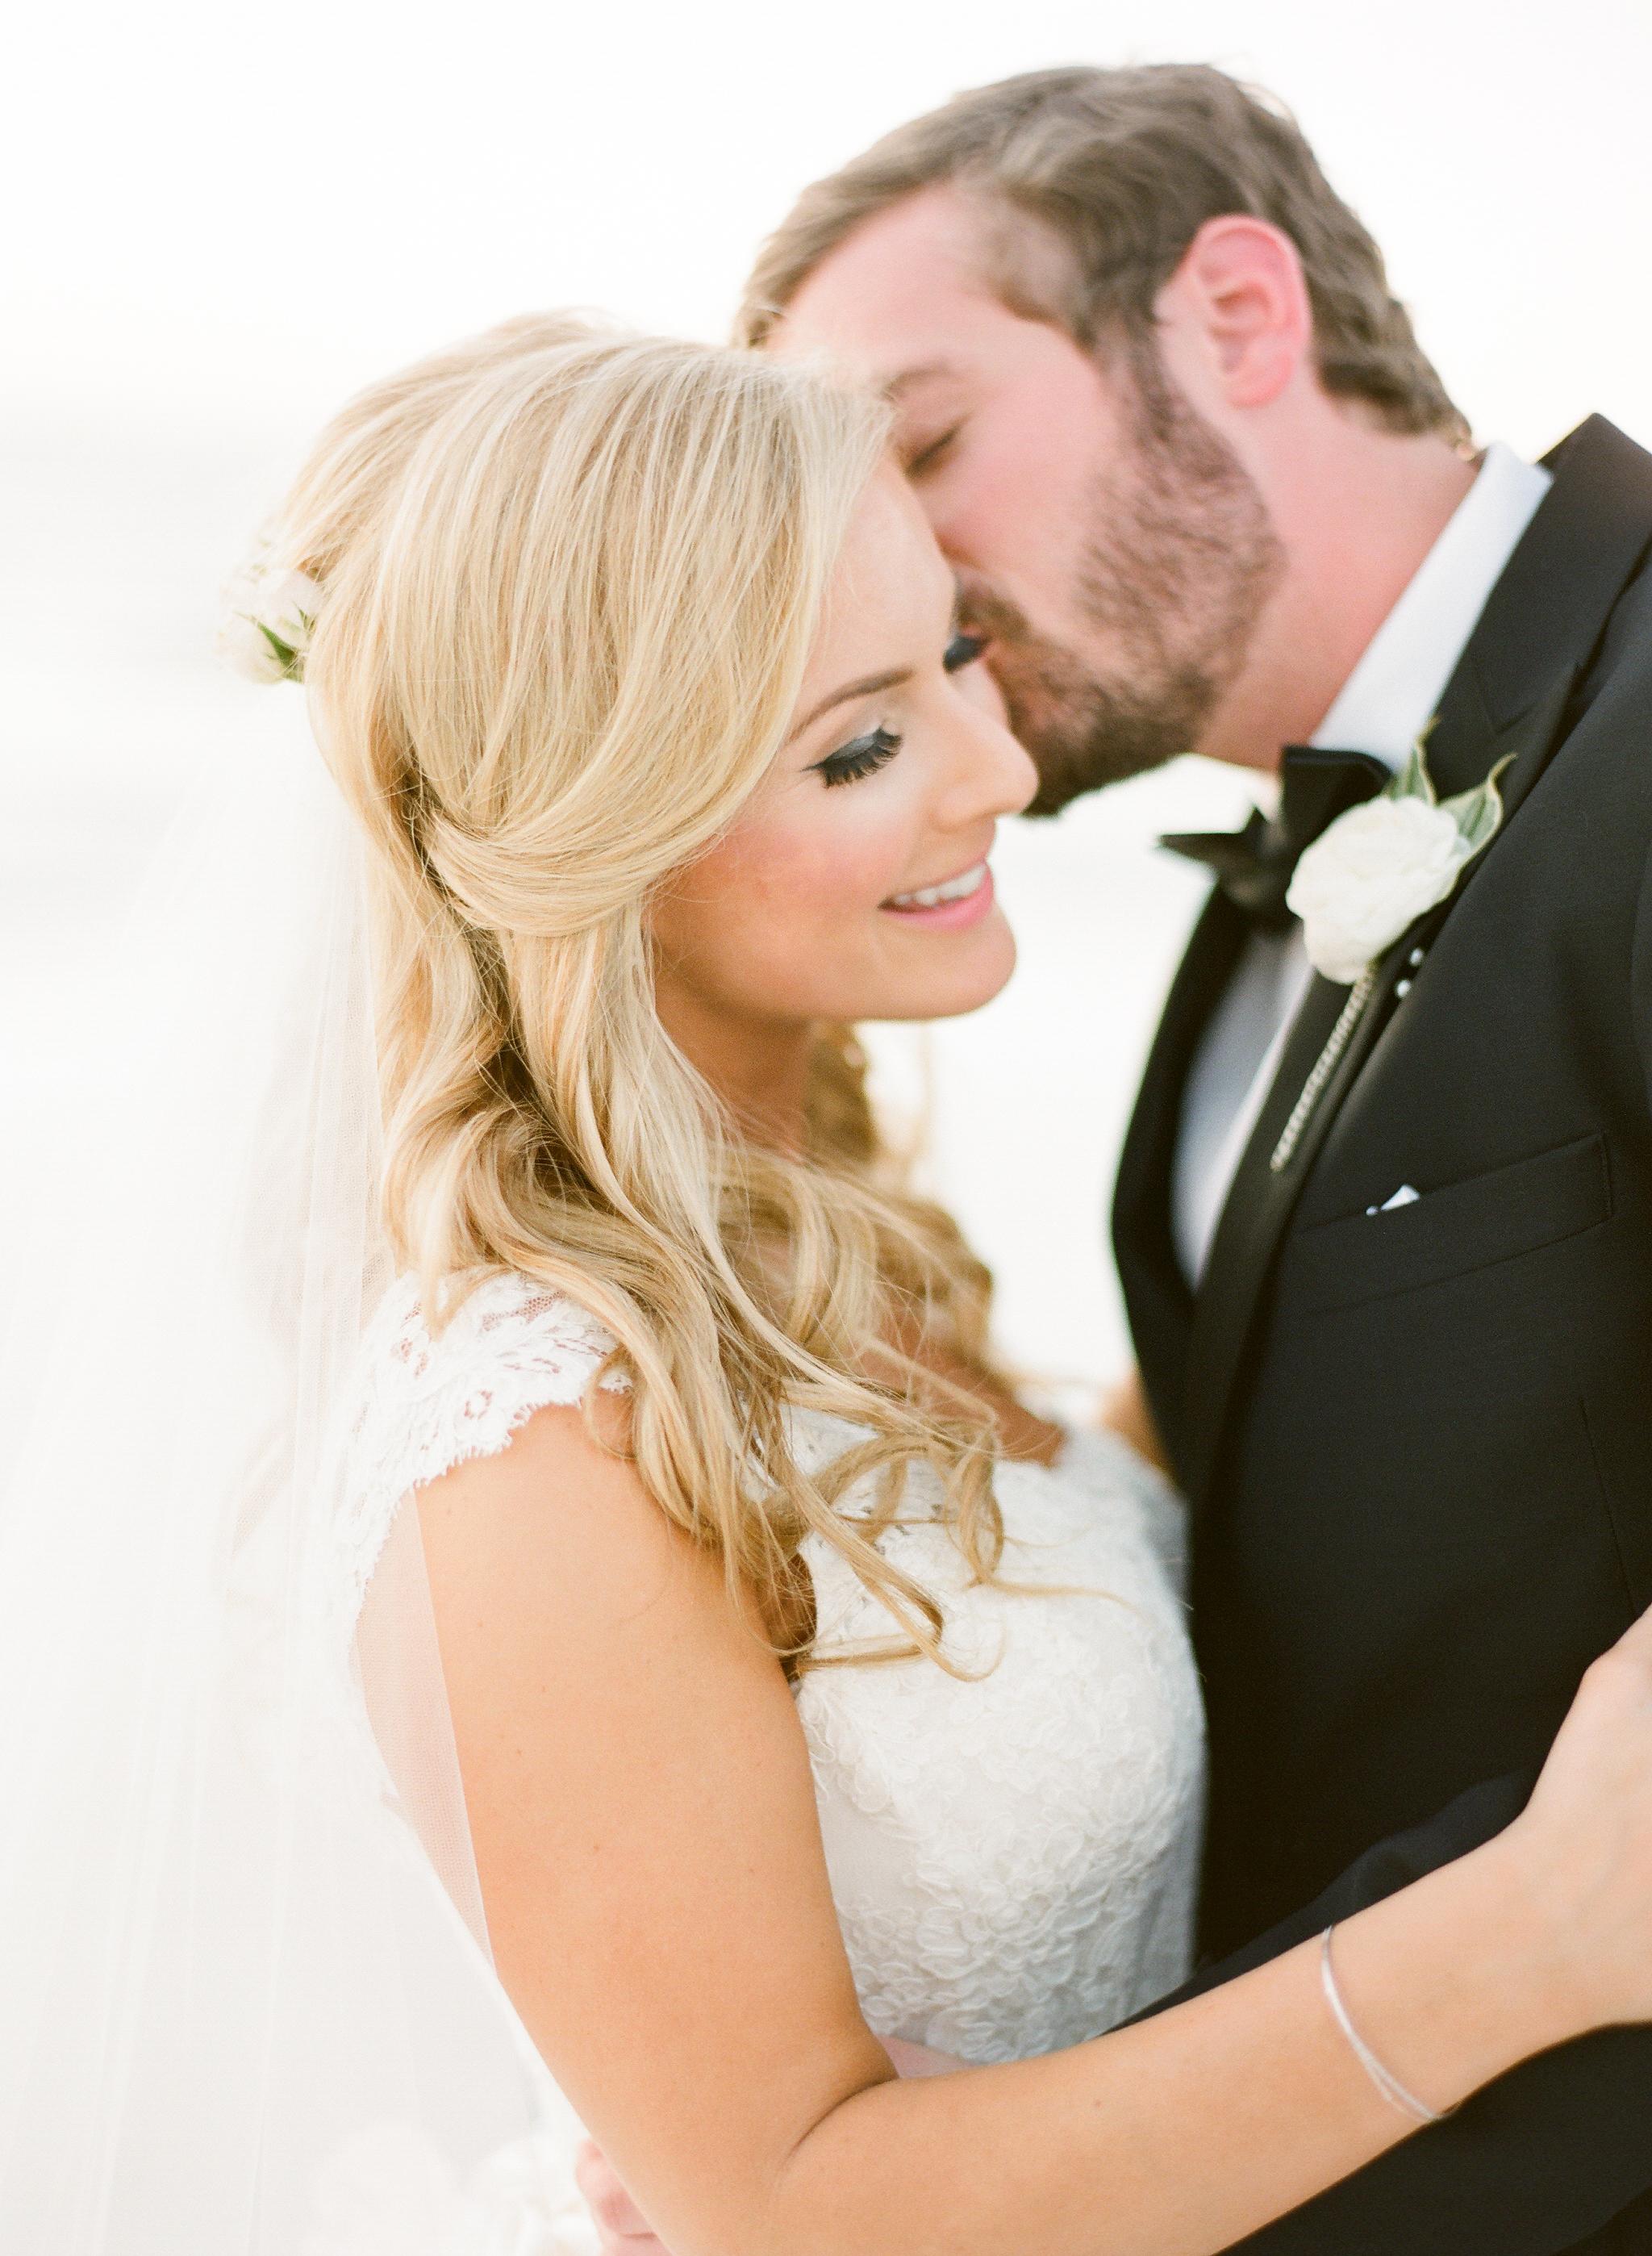 Ceci_New_York_Florida_Wedding_Style_Bride_Watercolor_Real_Custom_Luxury_93.jpg